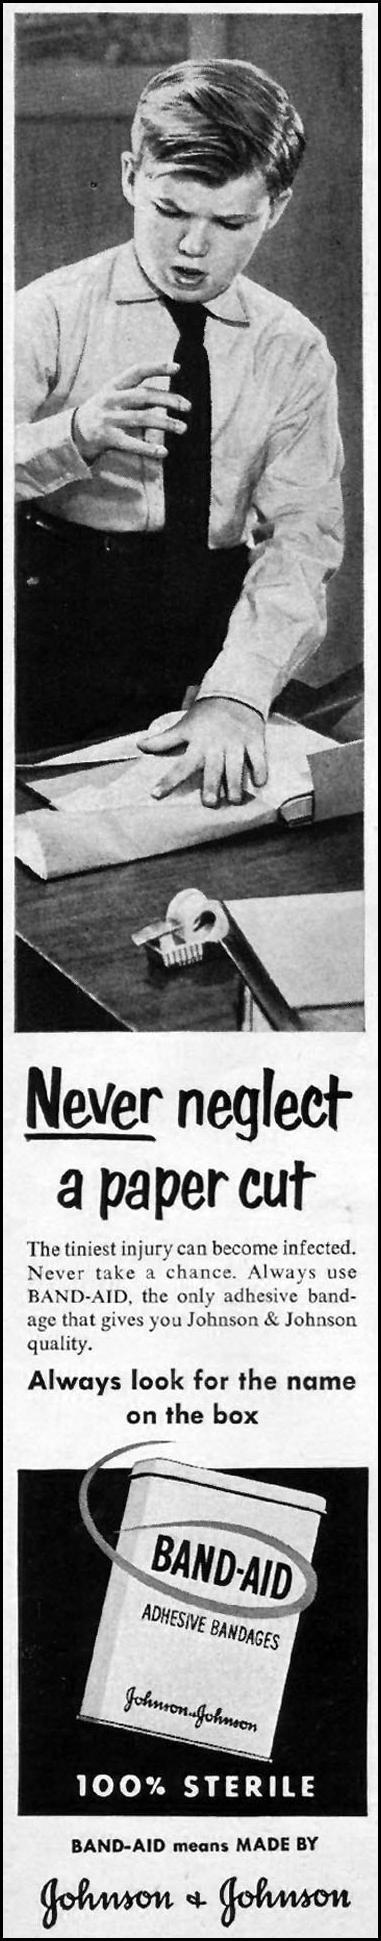 BAND-AID ADHESIVE BANDAGES LIFE 10/01/1951 p. 108